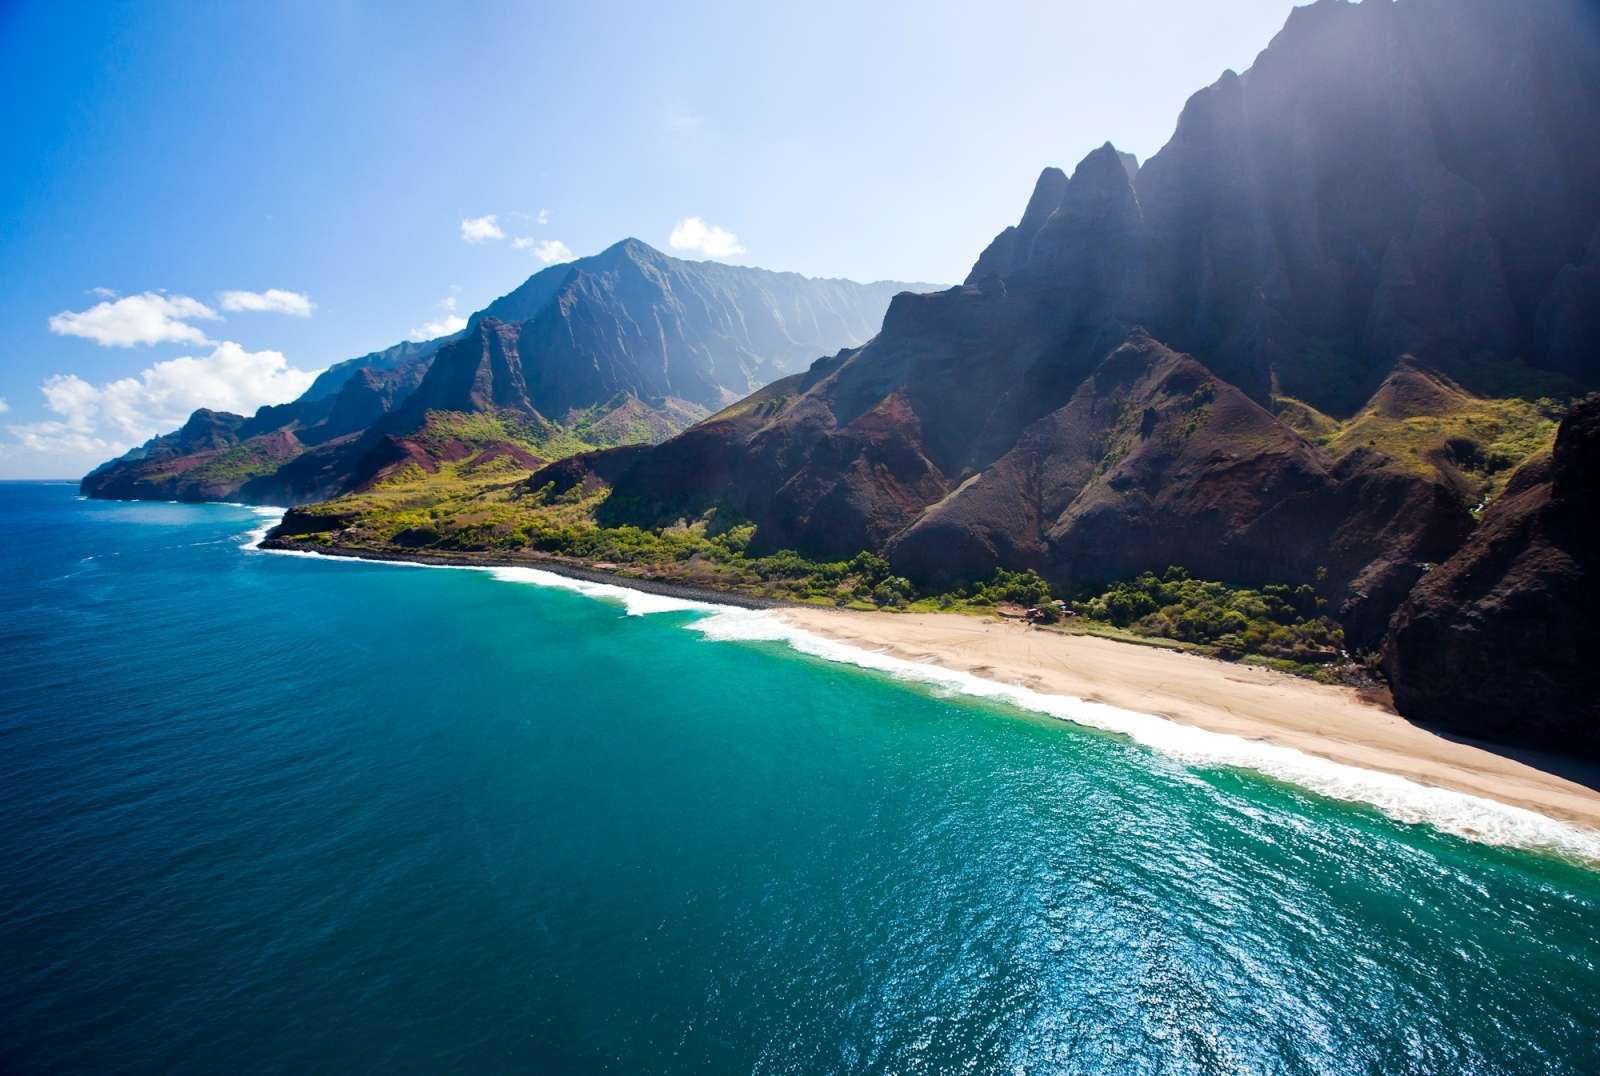 Hawaii Tourism Authority (HTA) Tor Johnson